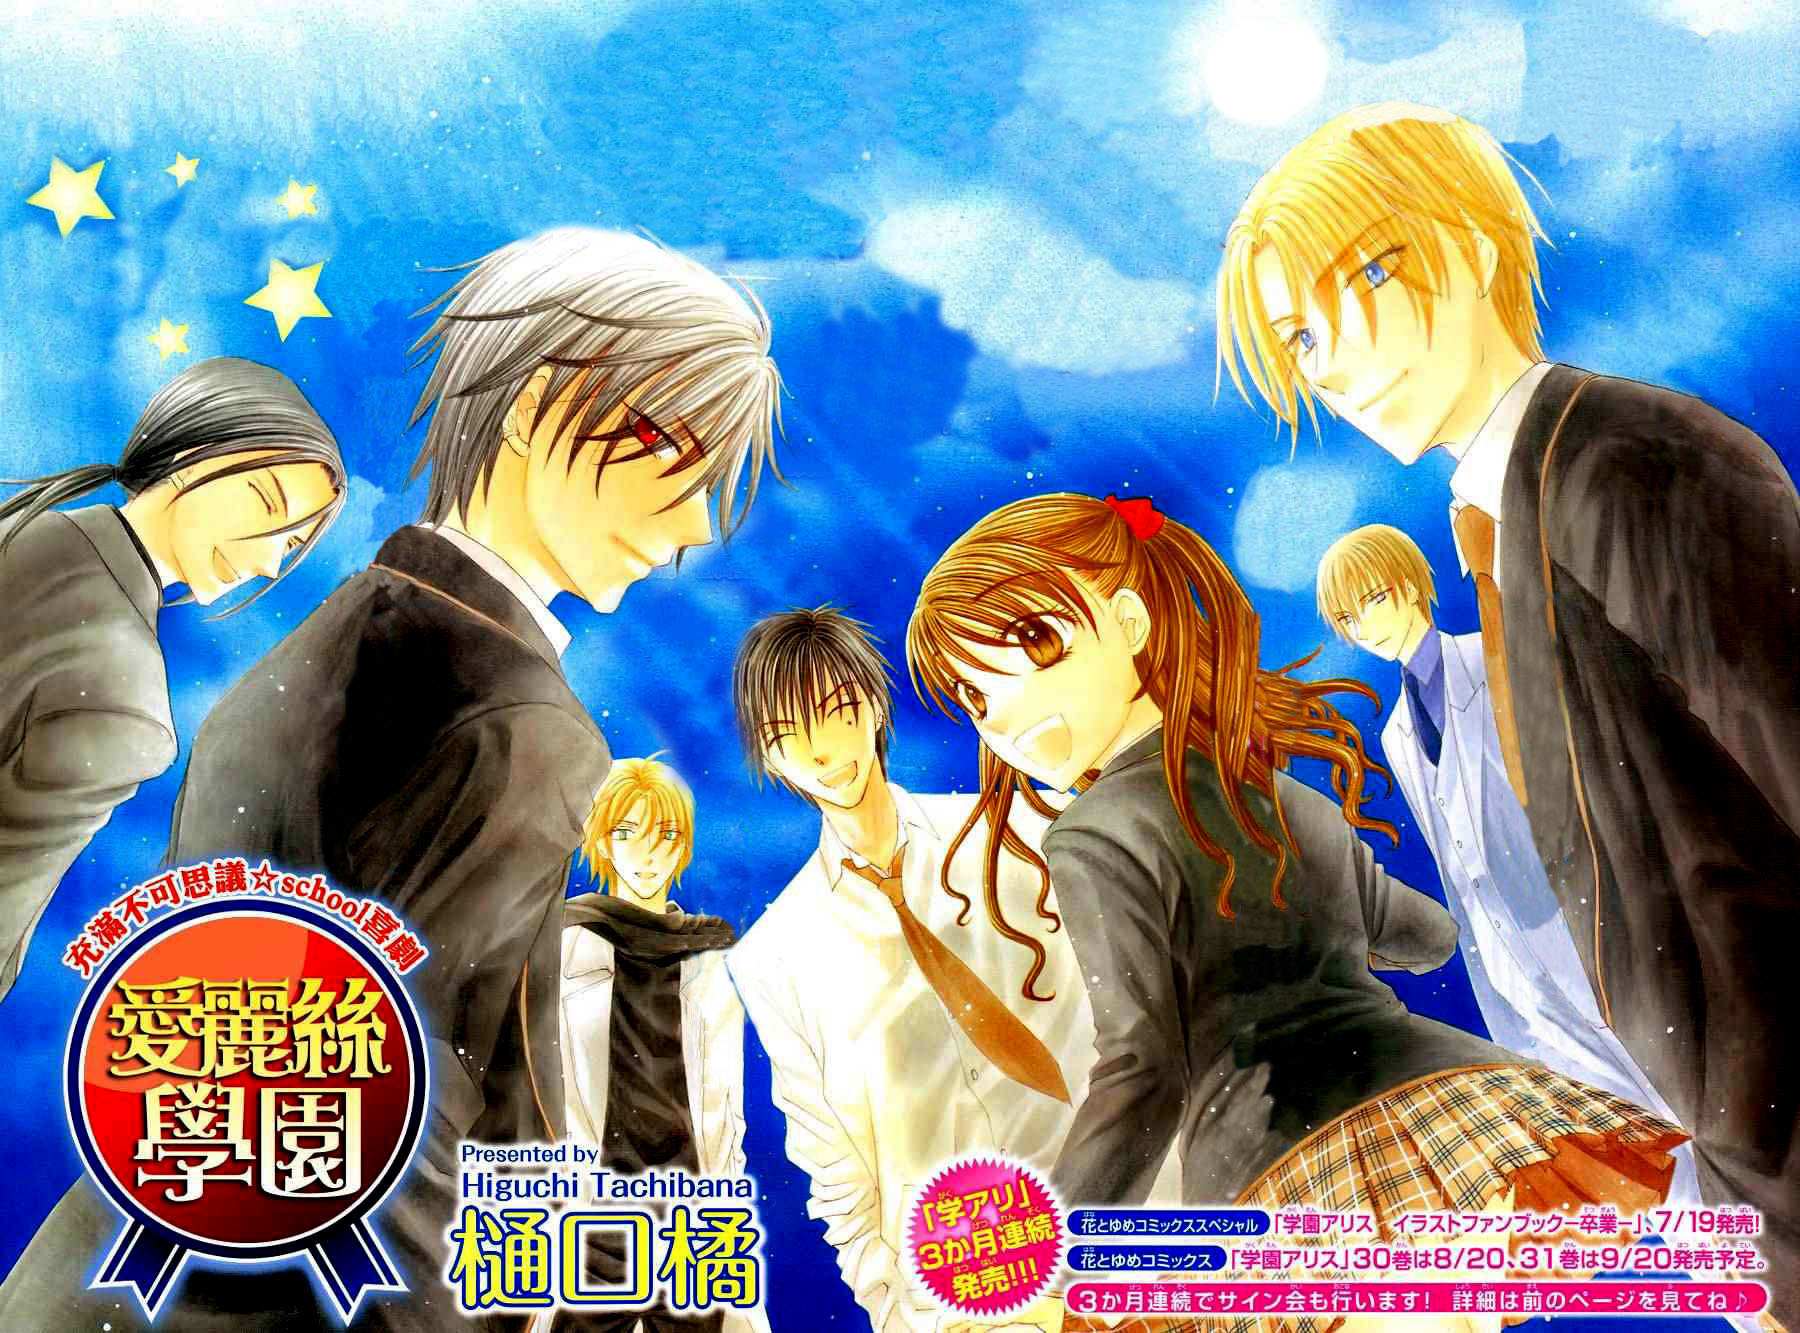 https://c5.ninemanga.com/es_manga/39/551/438570/0995bb712b9fc14c6d964a432e6524f3.jpg Page 1